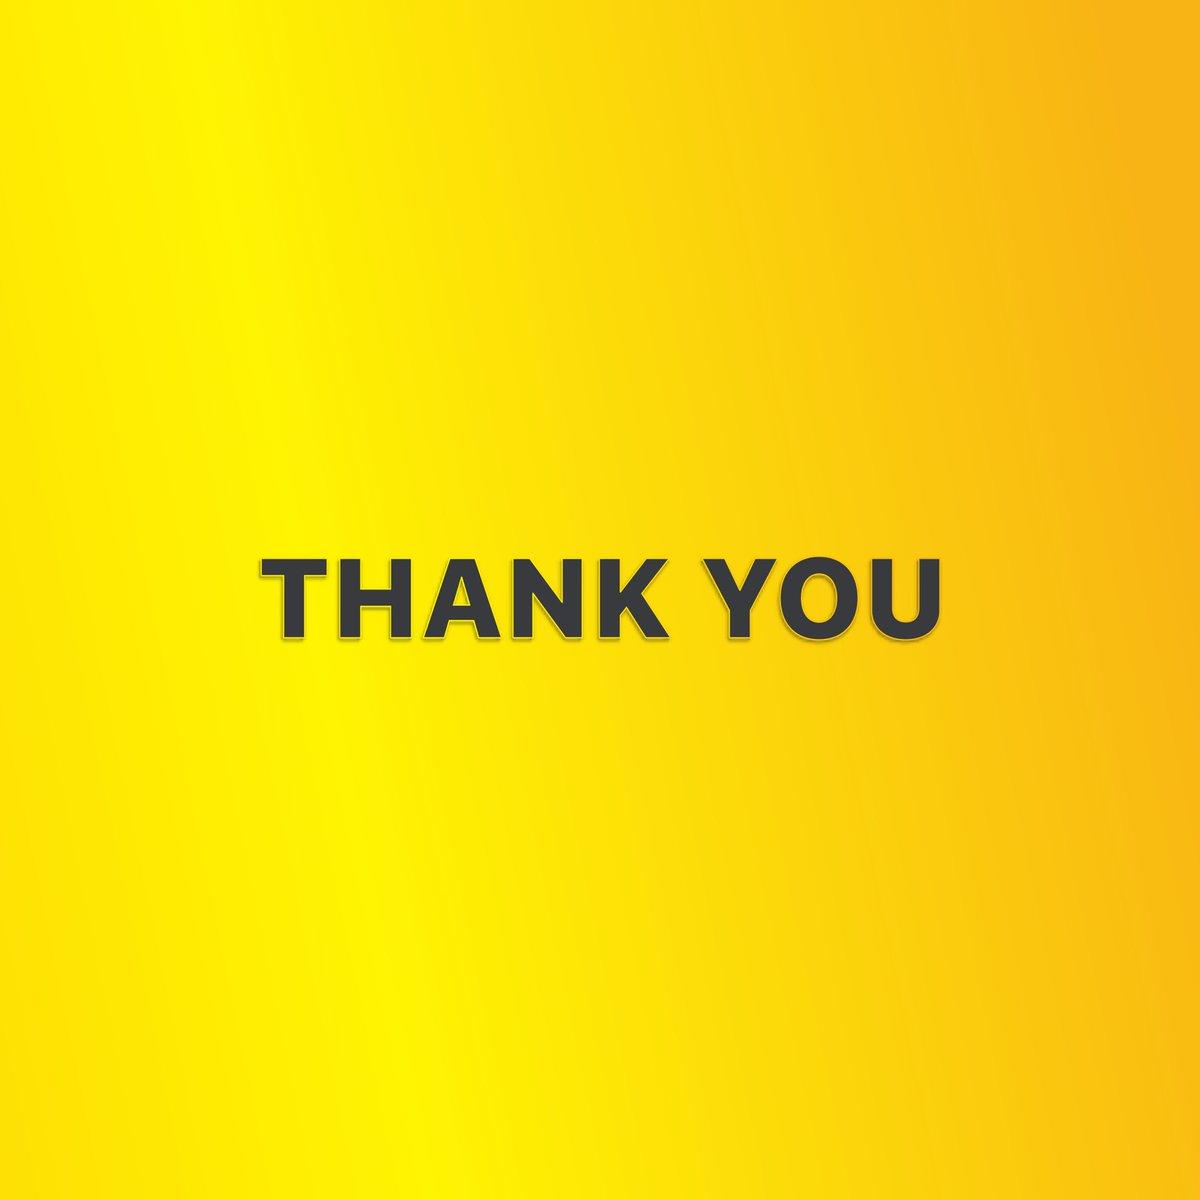 Lucky Day Luckydayapp Twitter Googleplay Gift Card 100k 41 Replies 37 Retweets 383 Likes